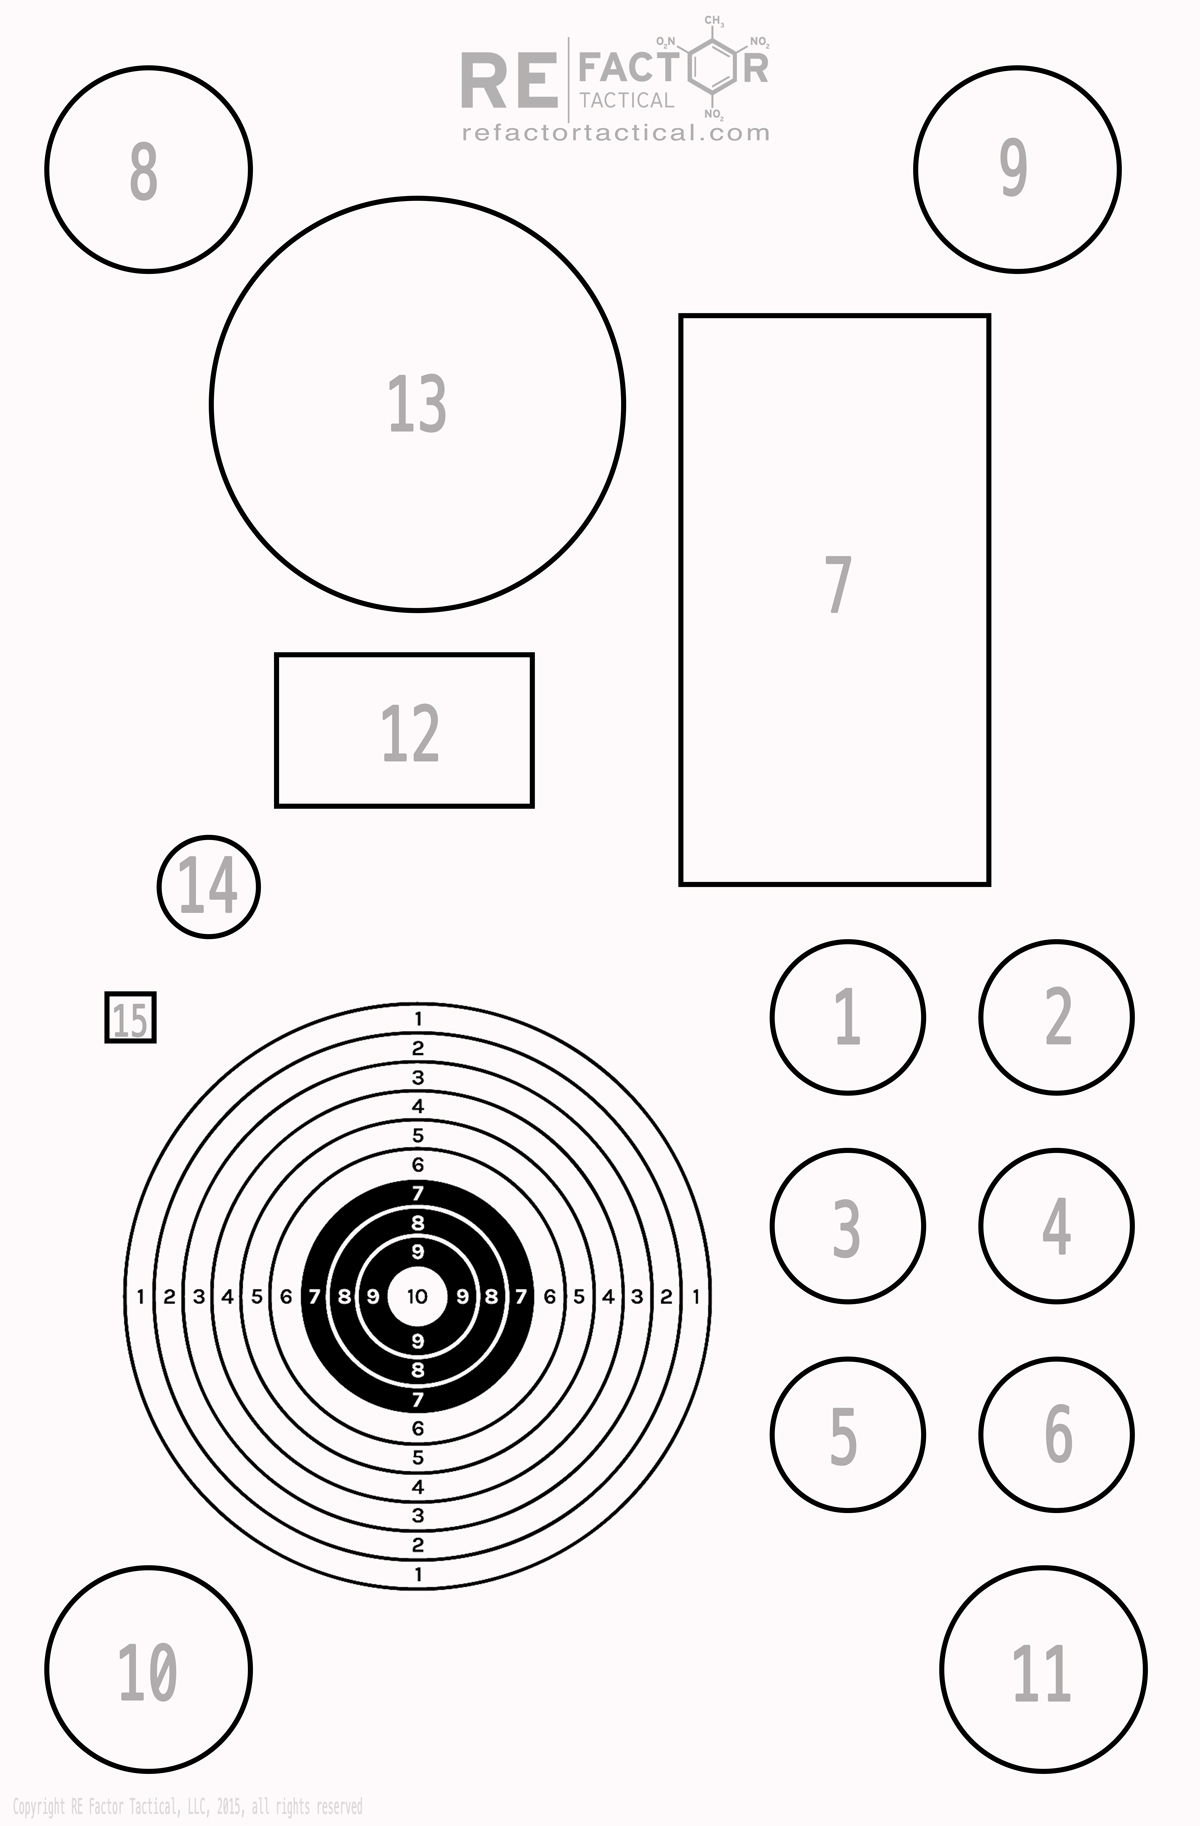 3 Shooting Targets That Take It Beyond a Basic Bullseye